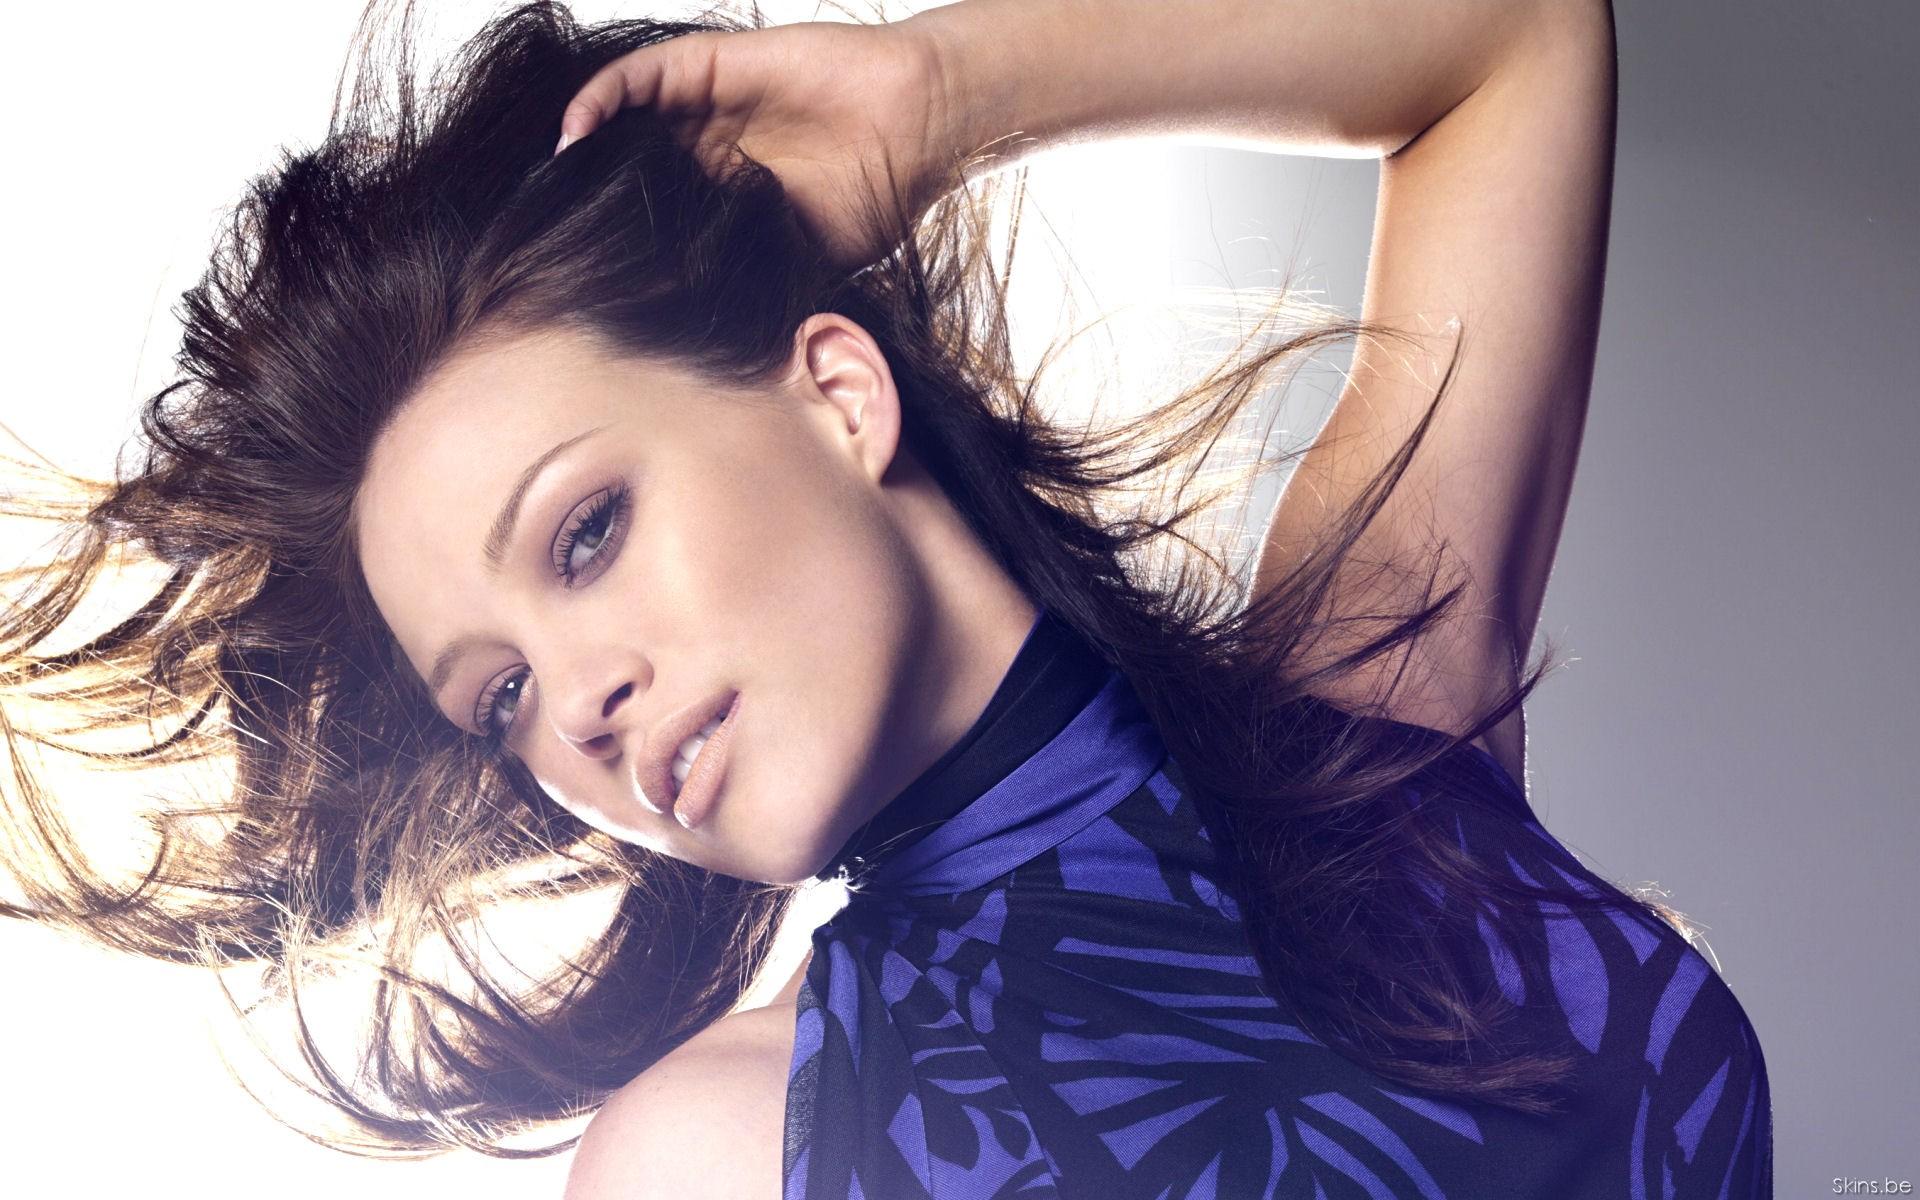 #4590902 #hands on head, #Adriana Lima, #face, #model, #